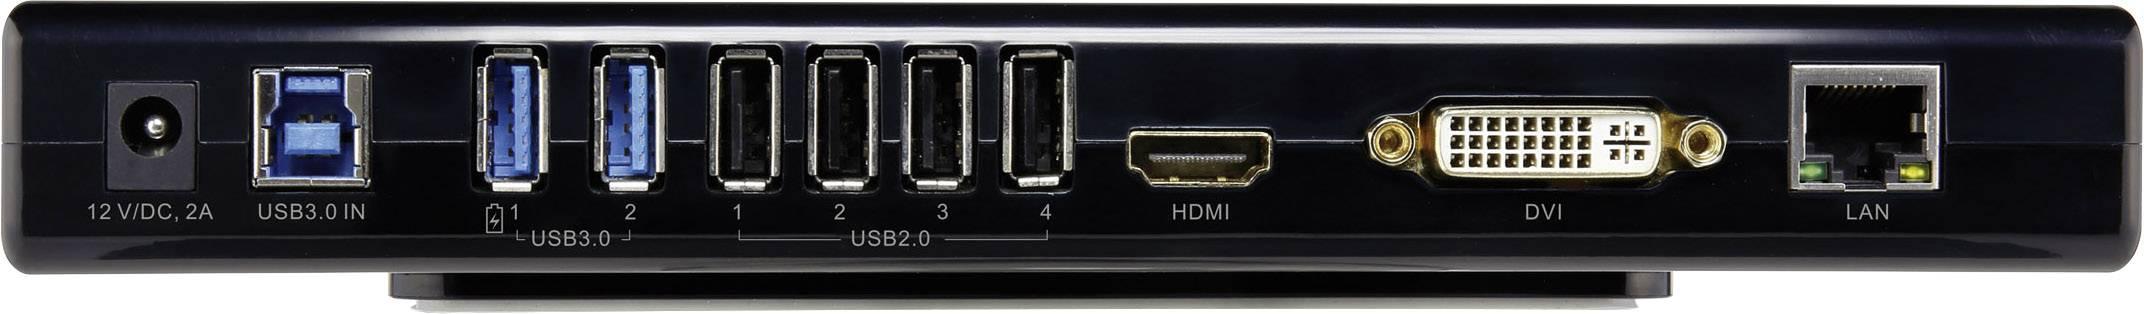 medium resolution of renkforcelaptop docking stationuniversal 2x usb 3 0 4x usb 2 0 1x hdmi headphones